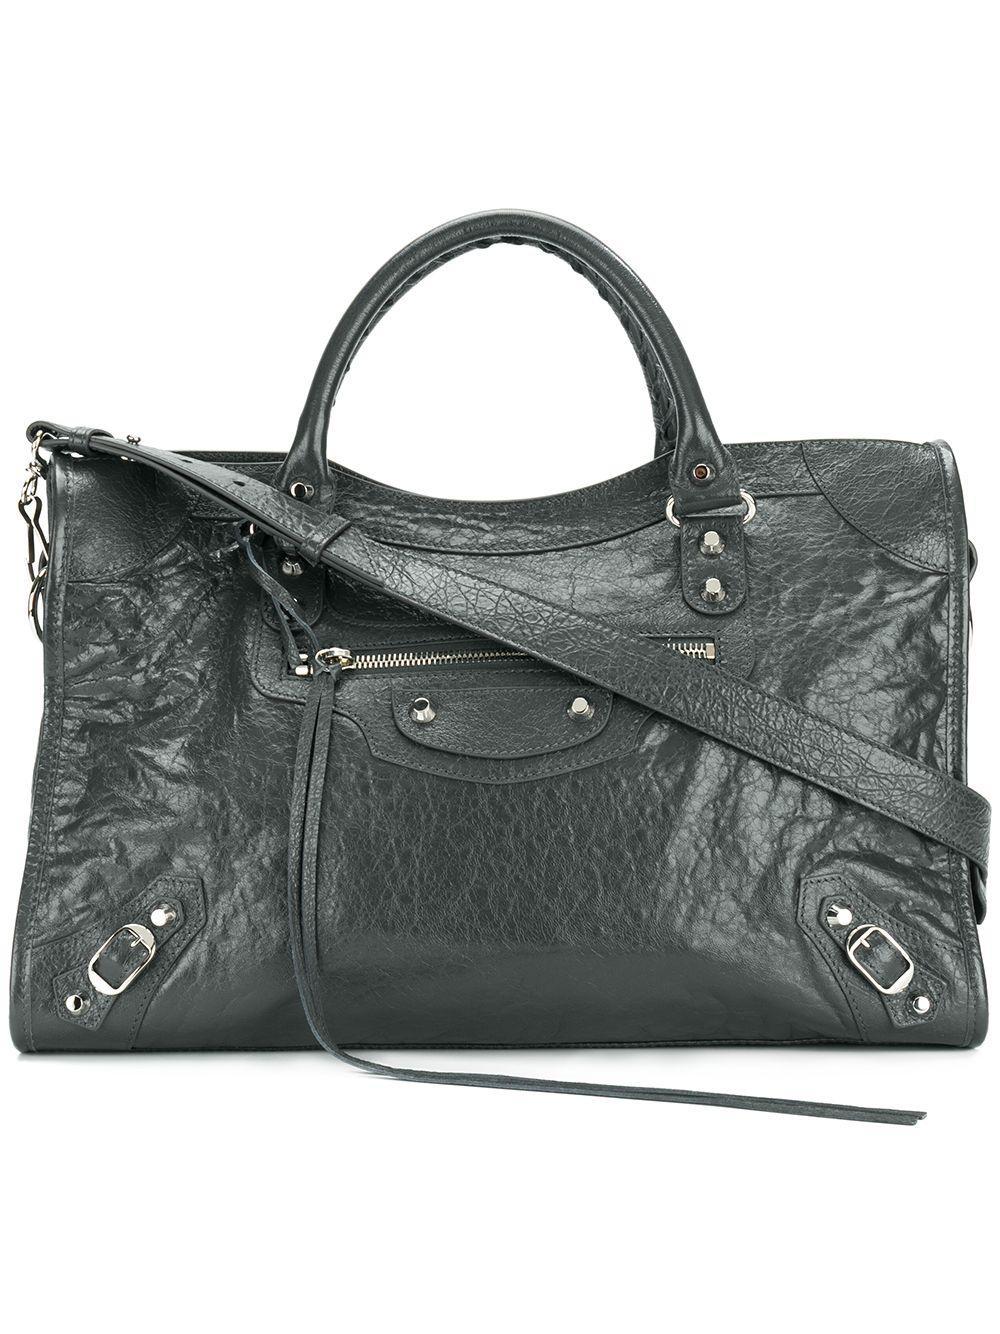 825765568f Balenciaga City Leather Shoulder Bag in Gray - Lyst